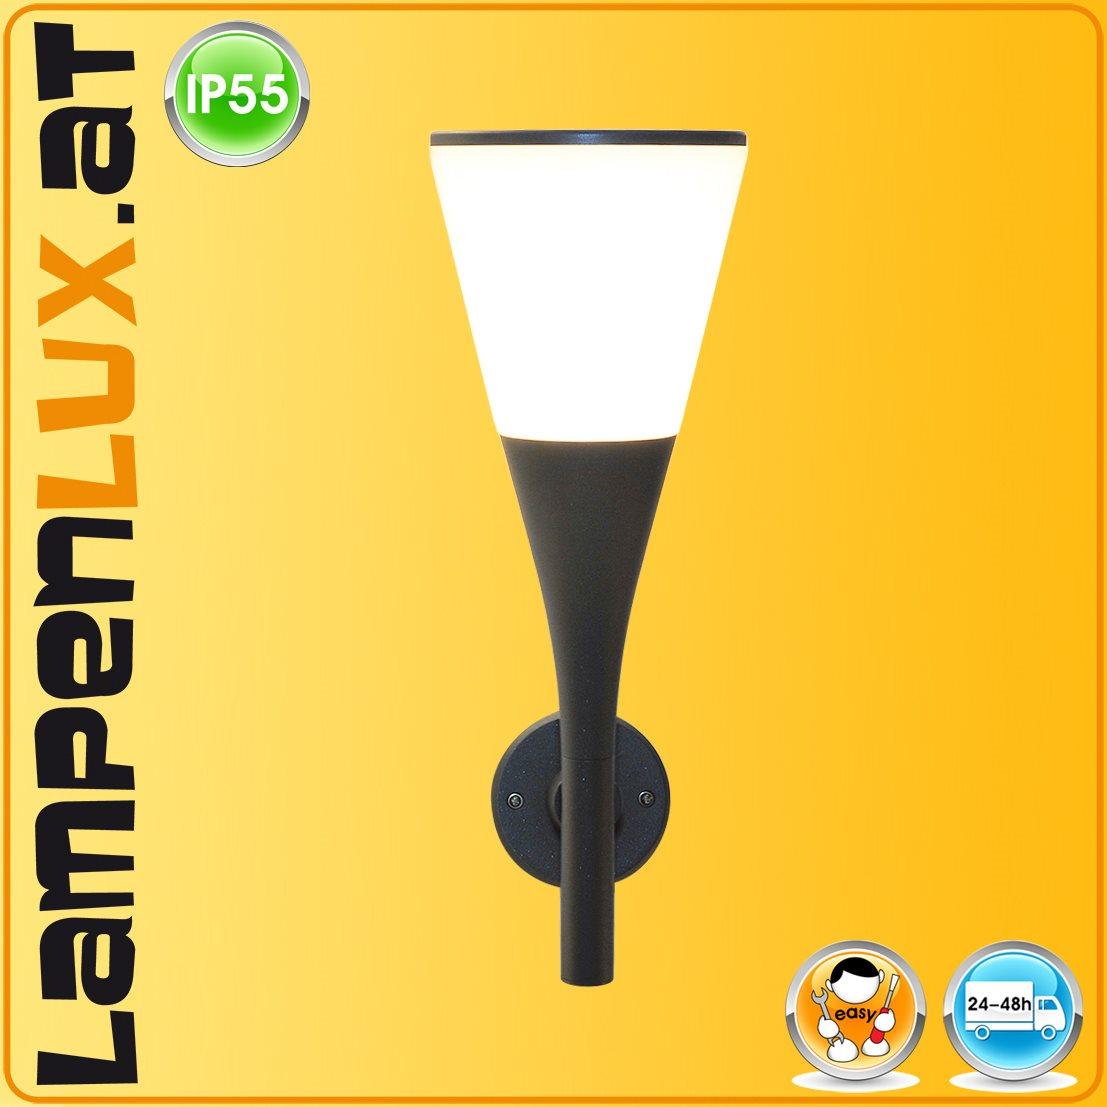 Lampenlux LED Aussenleuchte Esko IP55 Wandlampe Wandleuchte Fackel Aluminium Schwarz Fassung E27 Gartenlampe